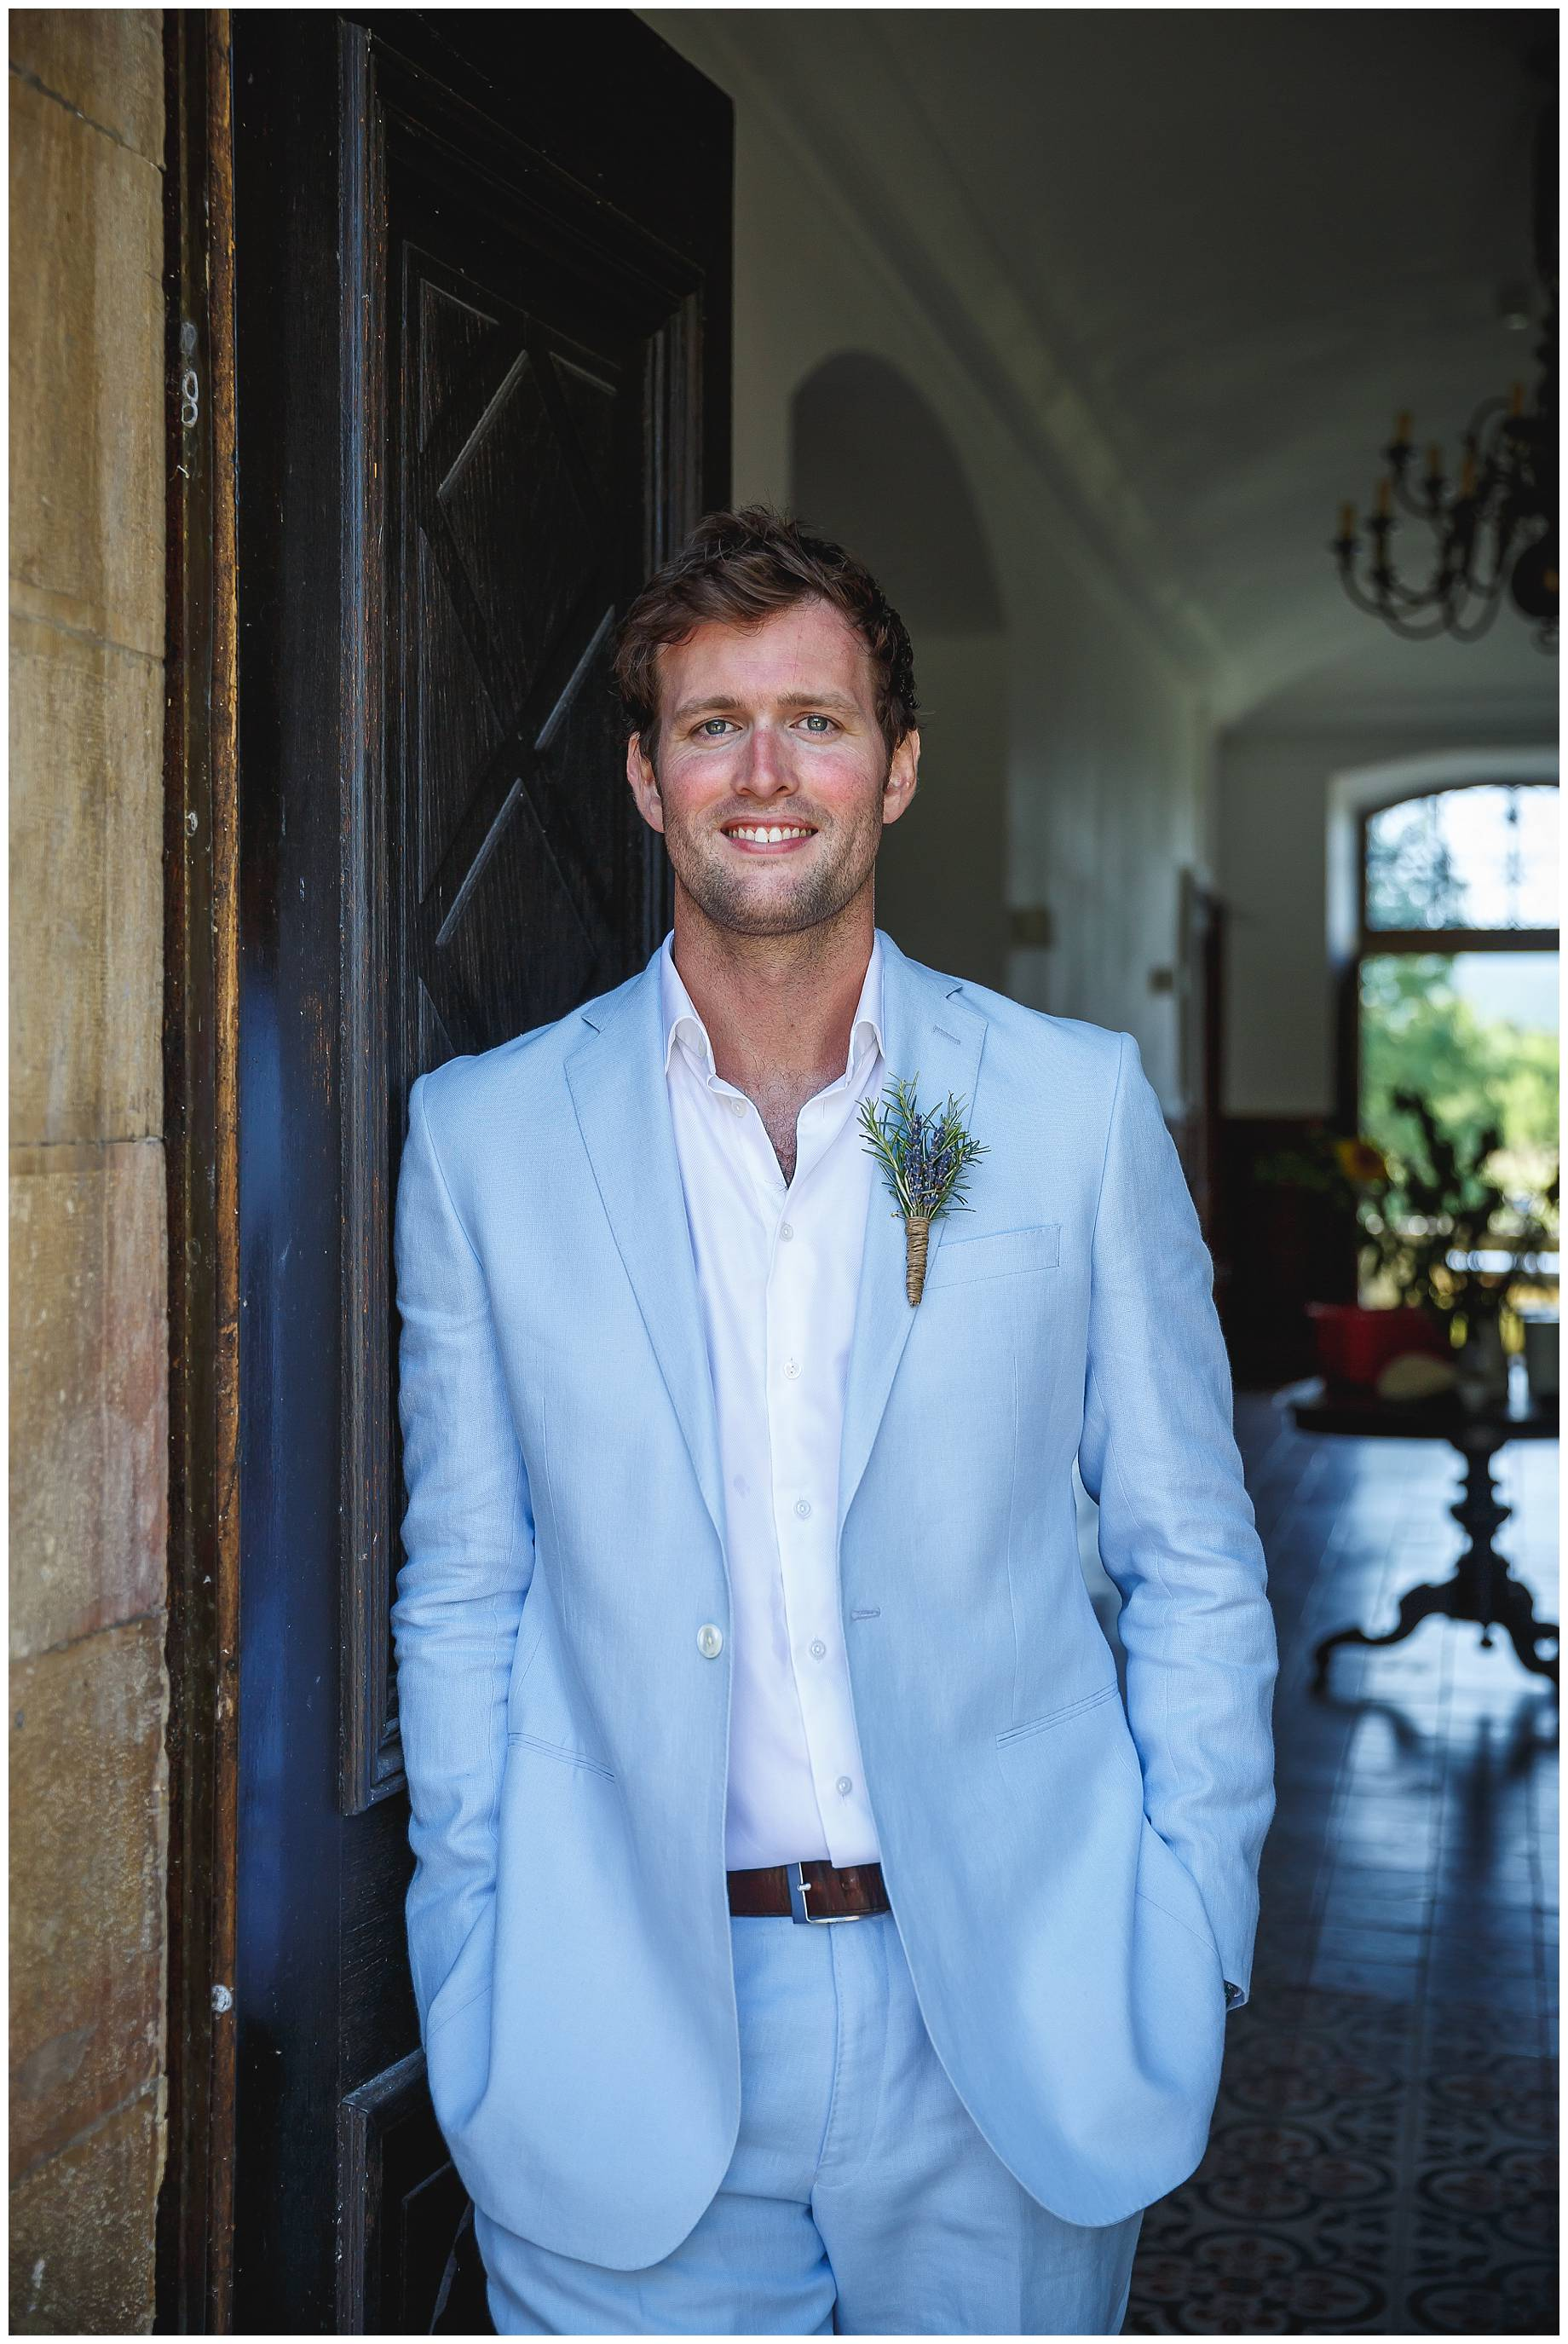 Sam the groom at Chateau du Bijou Wedding